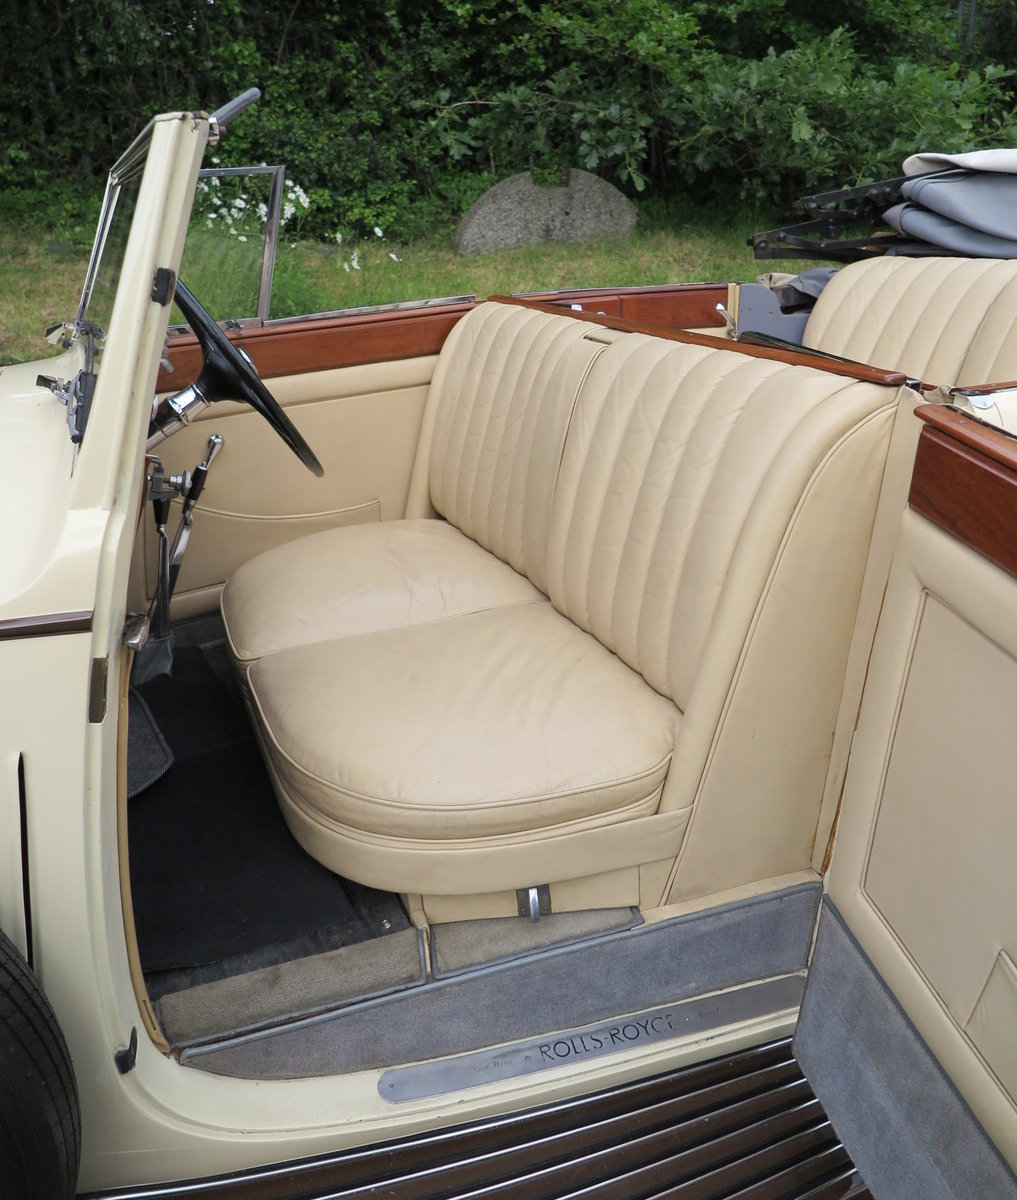 1938 Rolls-Royce 25/30 Park Ward 4 Dr  Cabriolet GGR54 For Sale (picture 5 of 6)